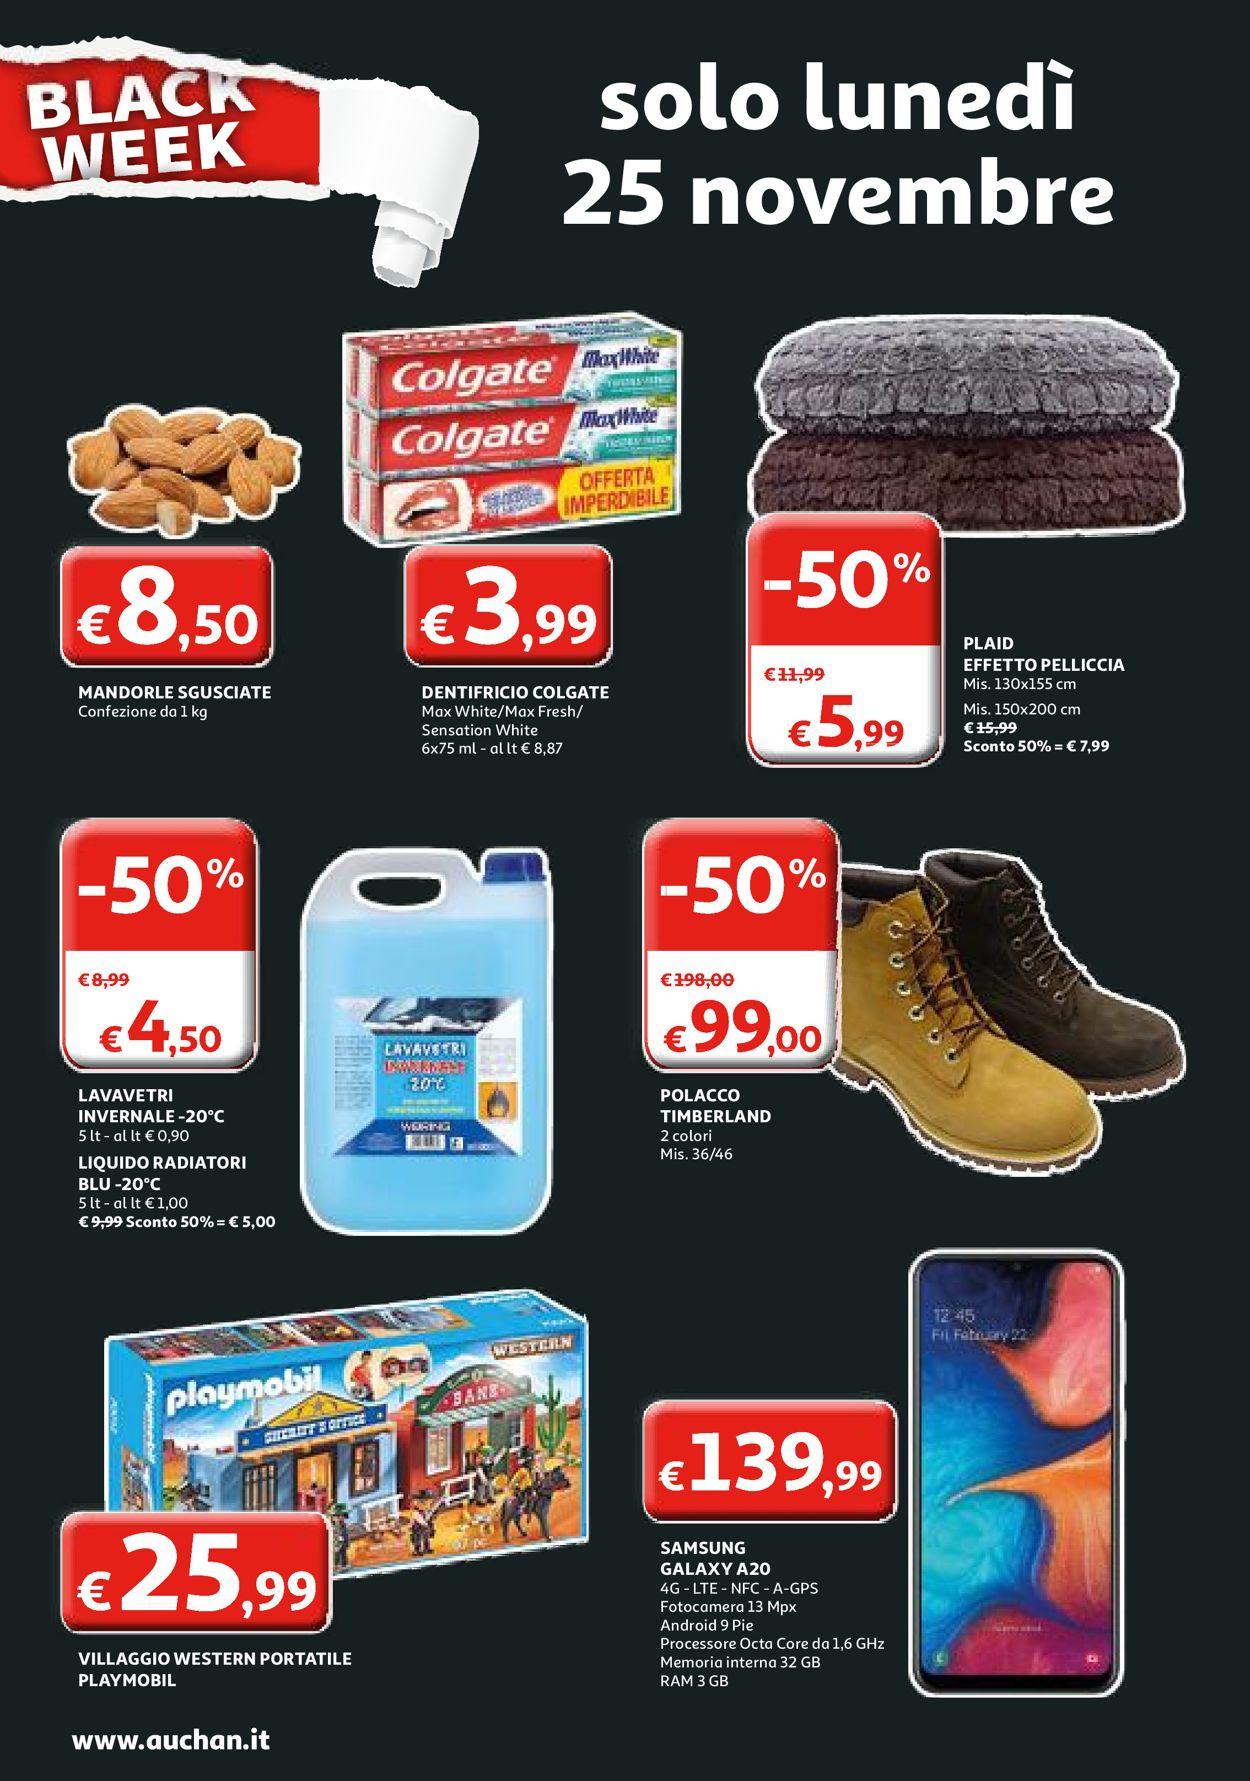 Volantino Auchan Black Friday 2019 - Offerte 25/11-01/12/2019 (Pagina 2)